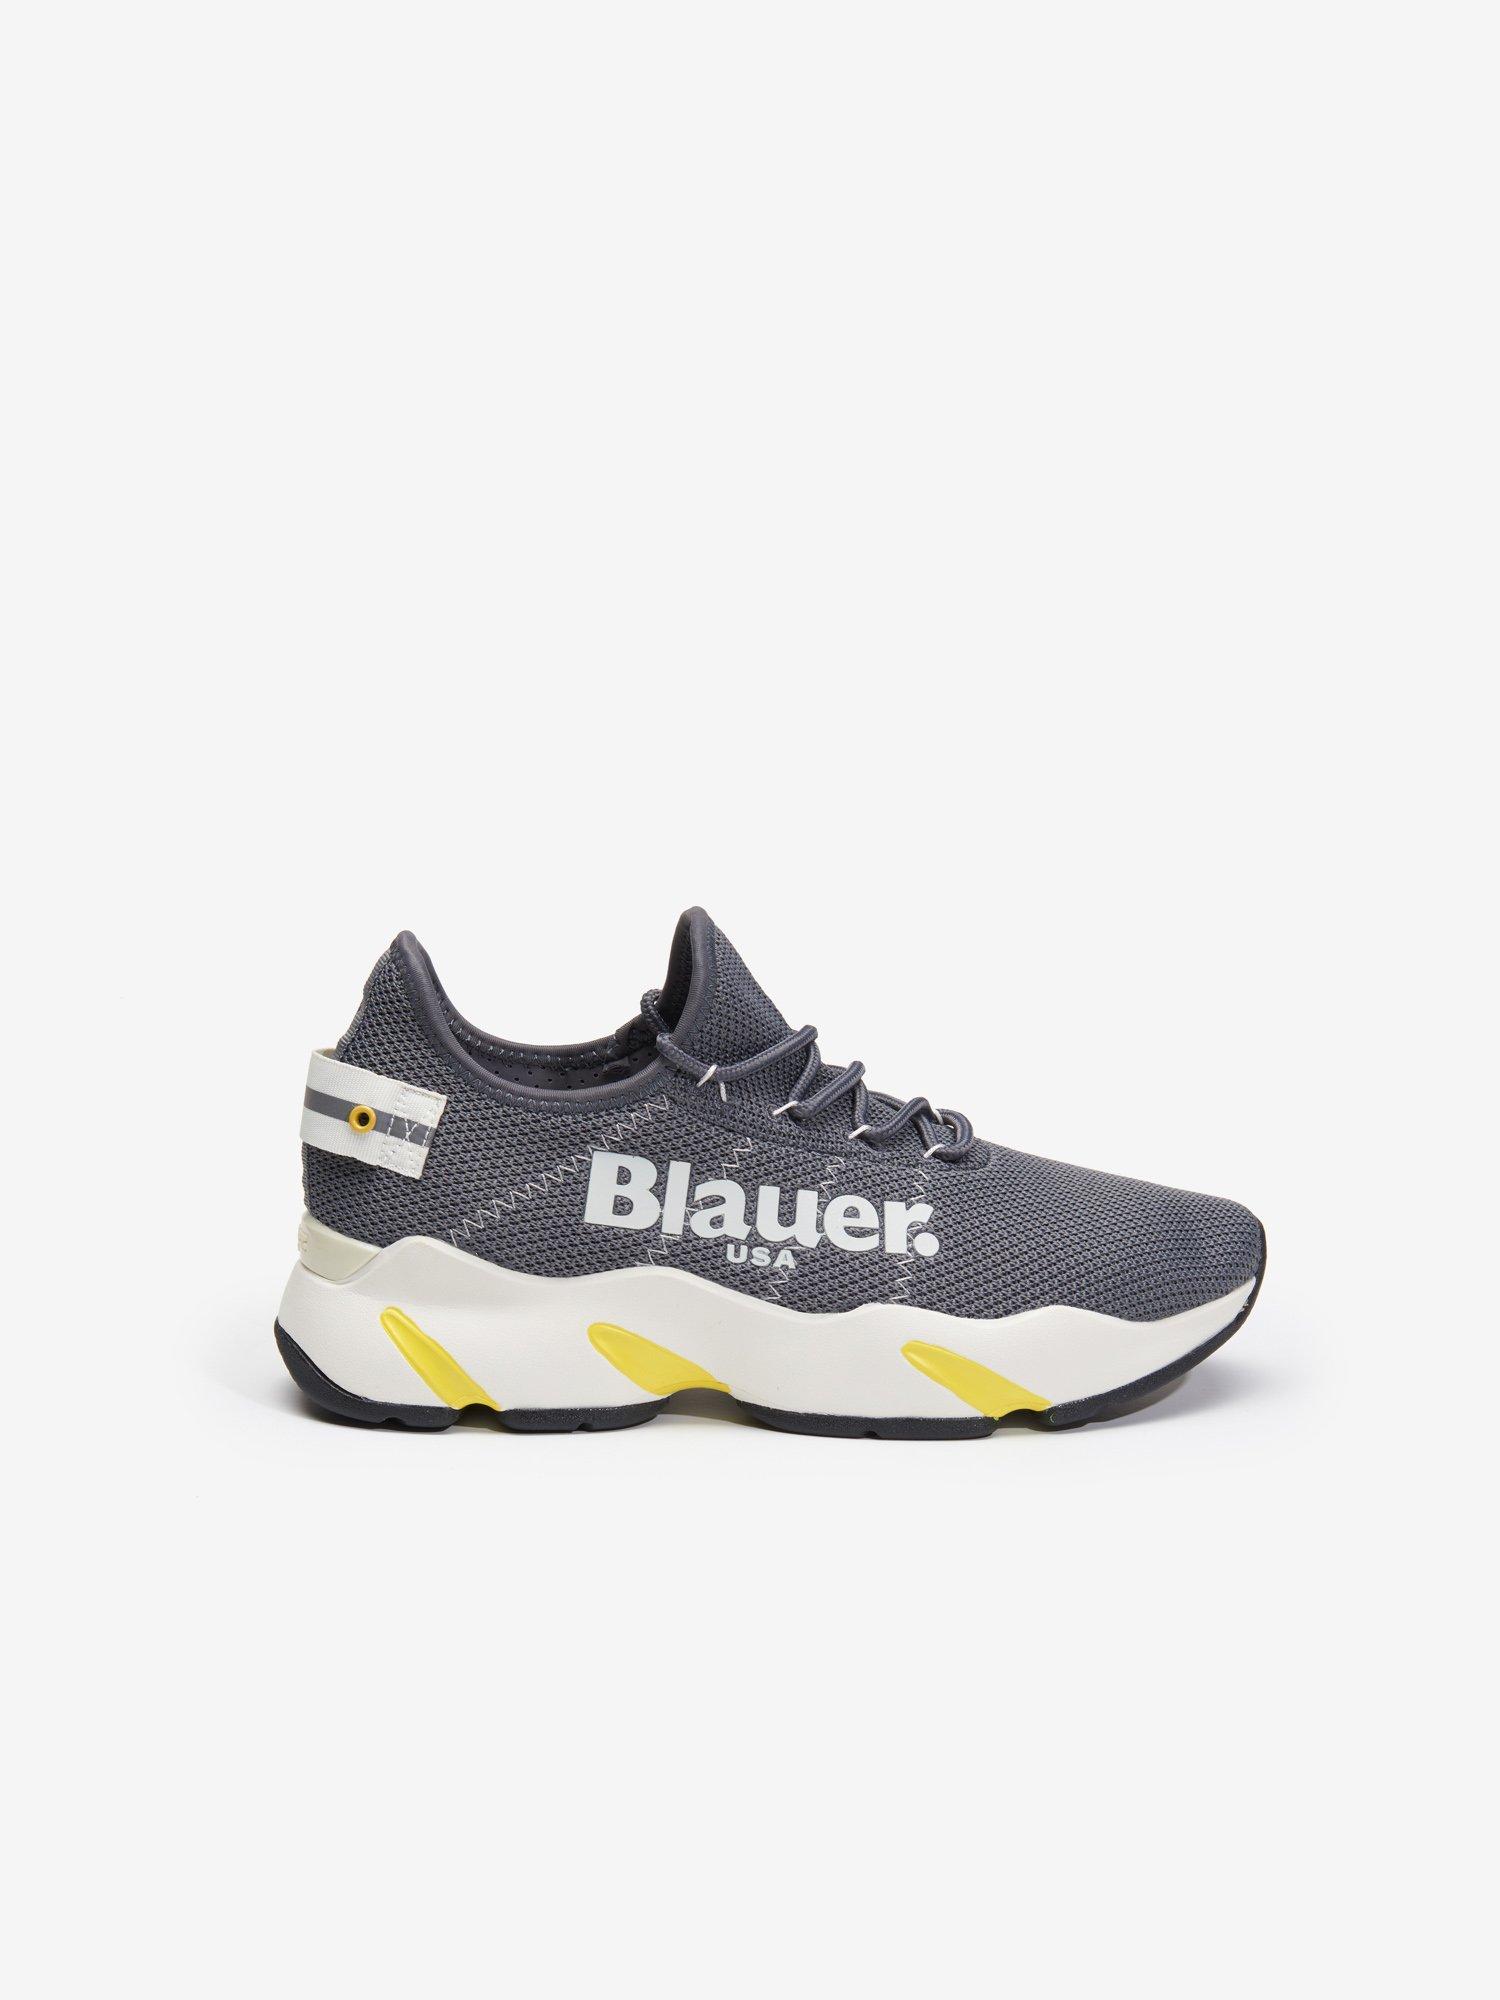 Sneakers Scarpe ® Blauer Acquista E OnlineUsa Uomo jA345qLR